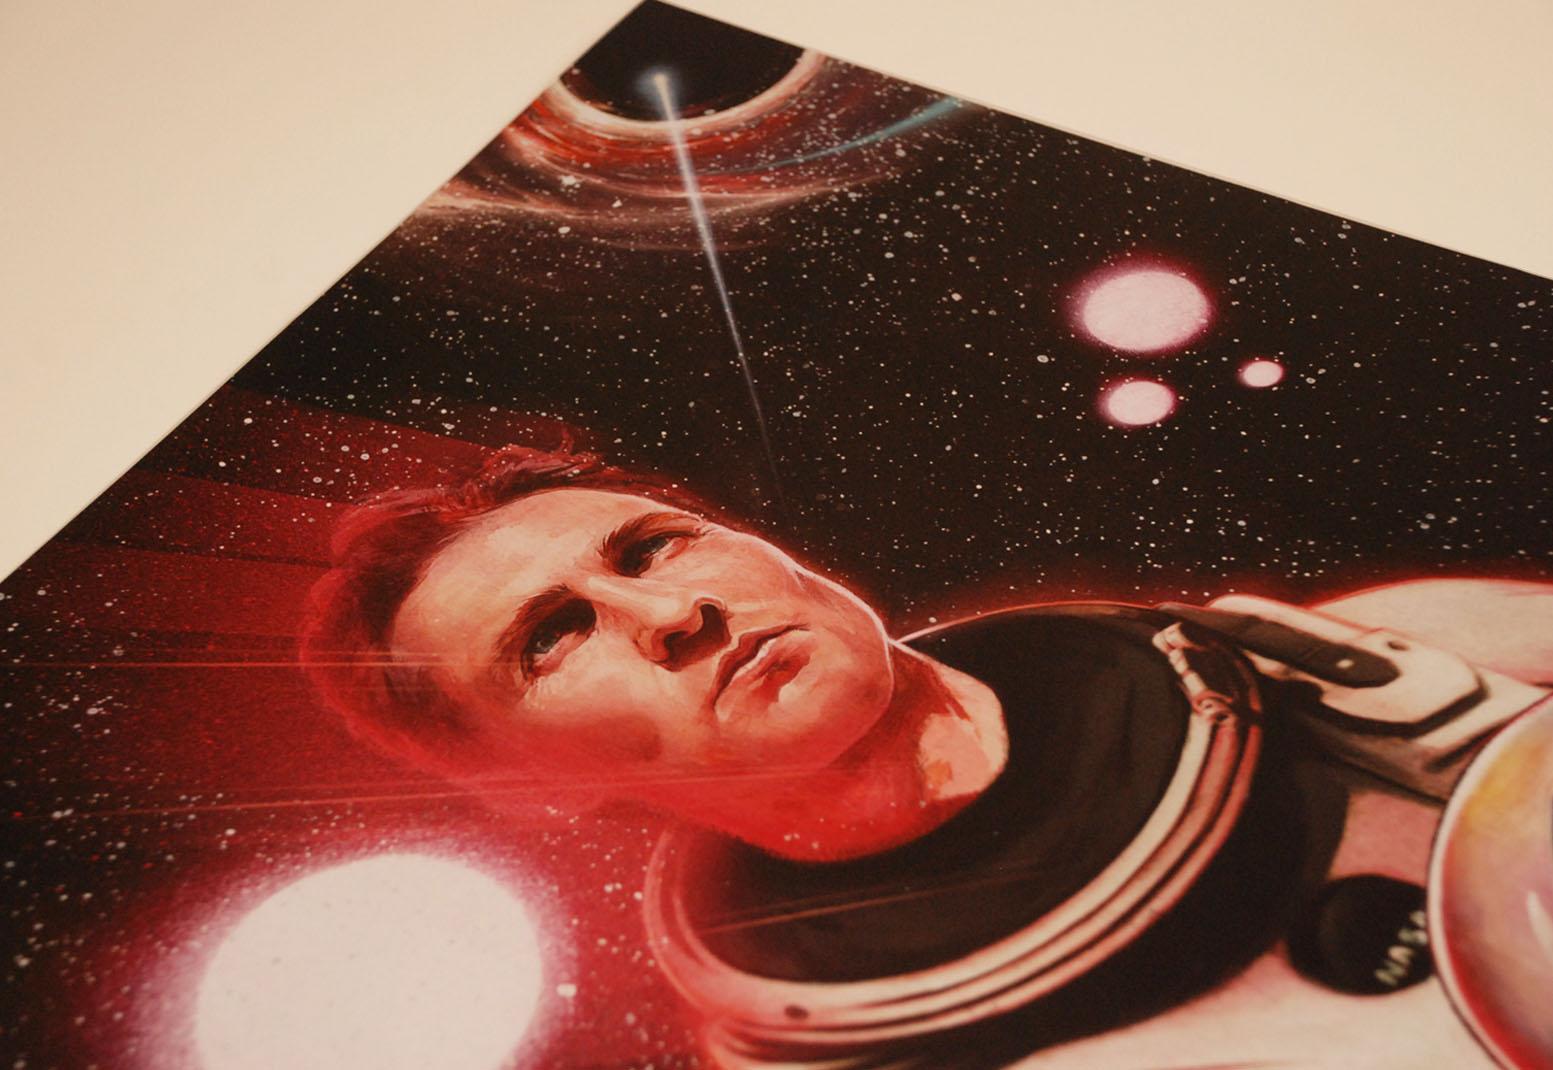 Interstellar Poster Art By John Keaveney 2014 3.jpg